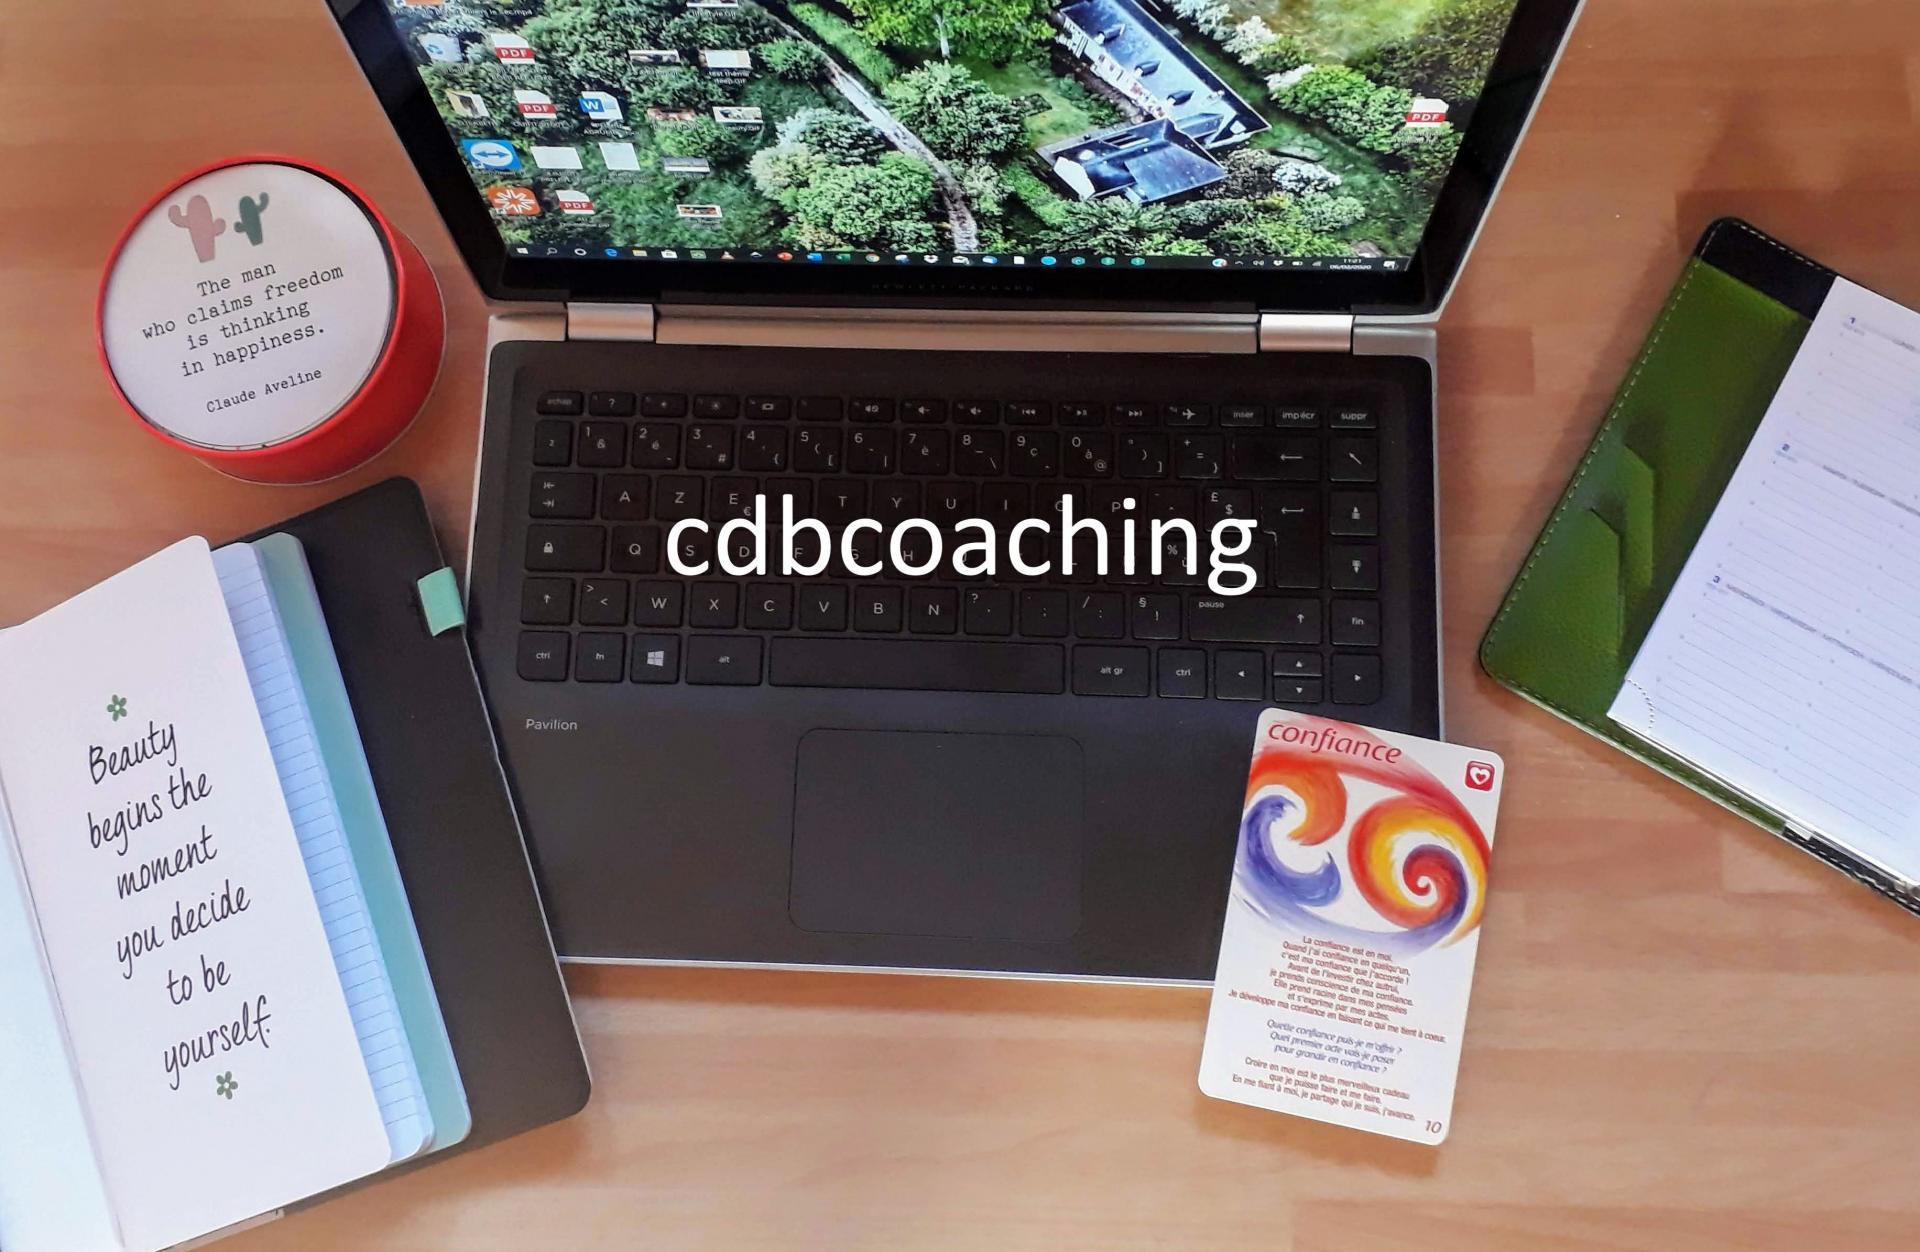 cdbcoaching